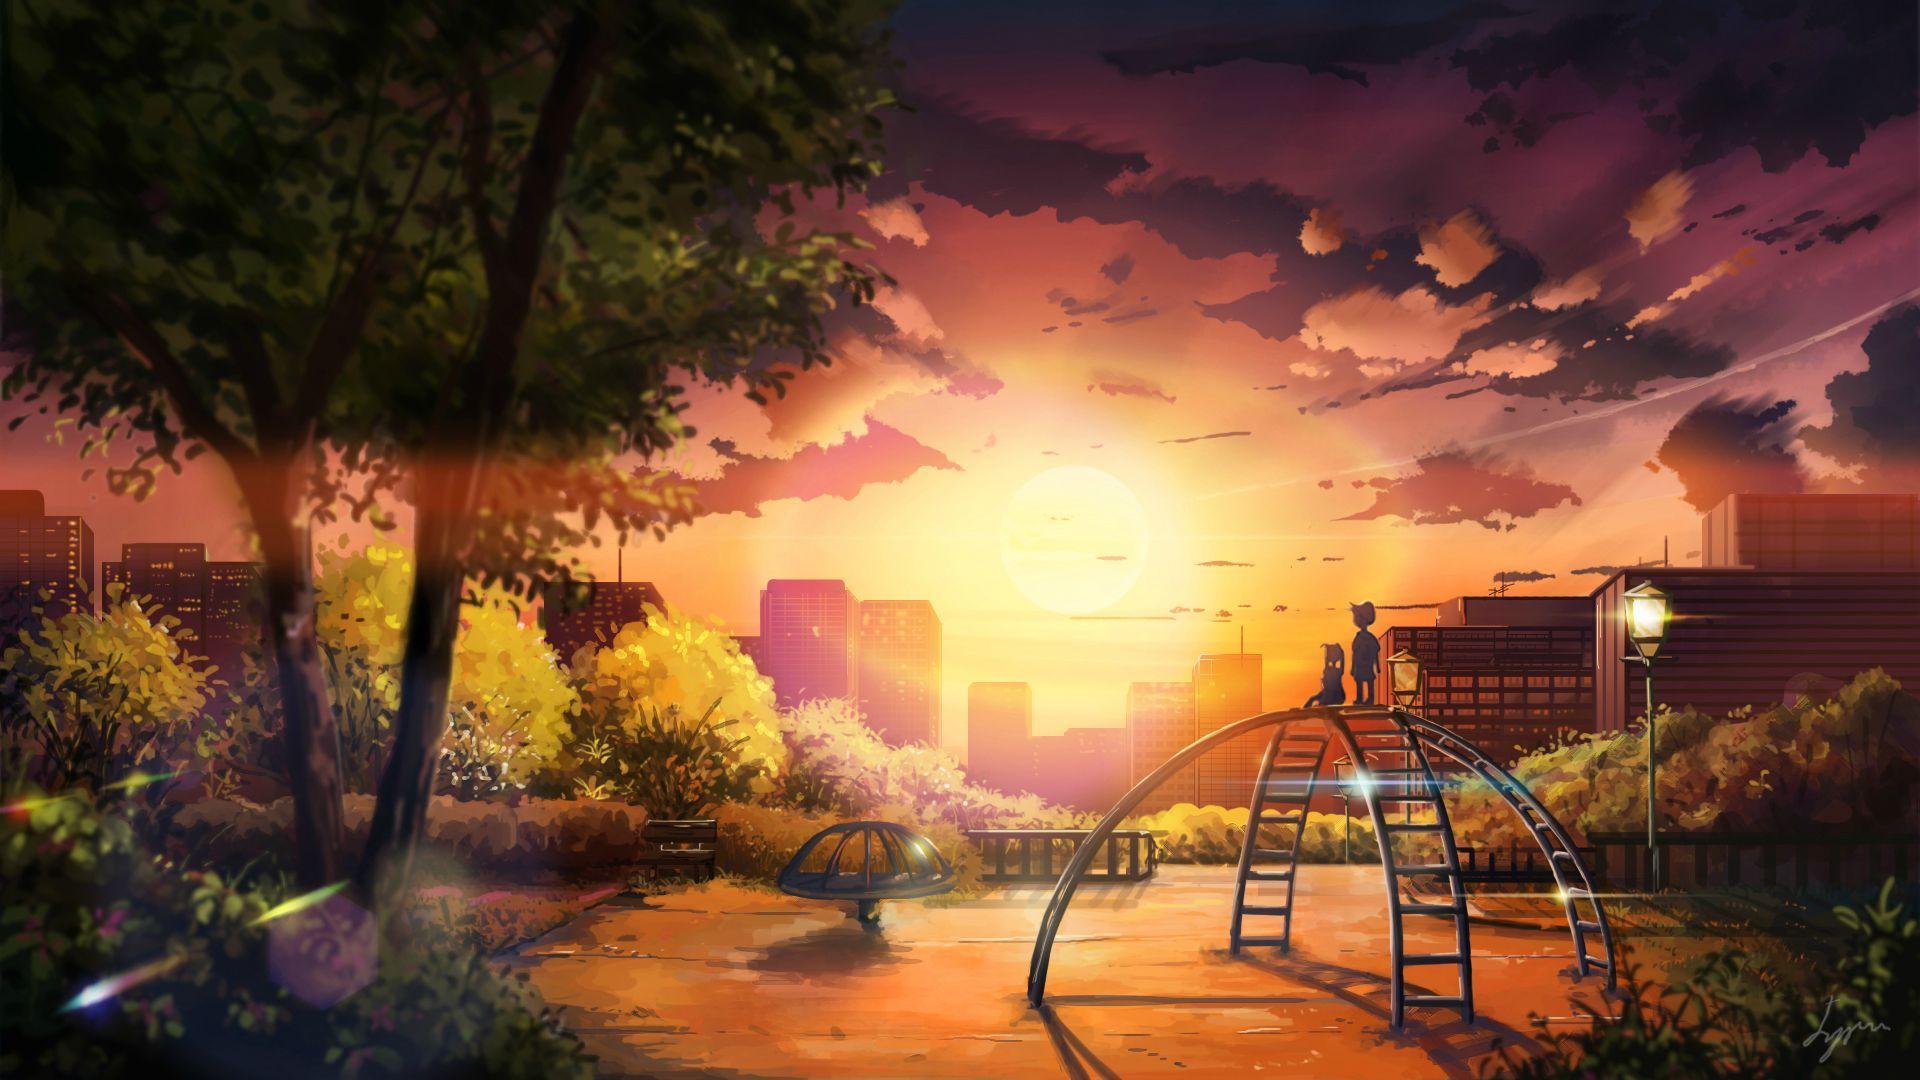 Imgur Post Imgur in 2020 Theatrical scenery, Anime